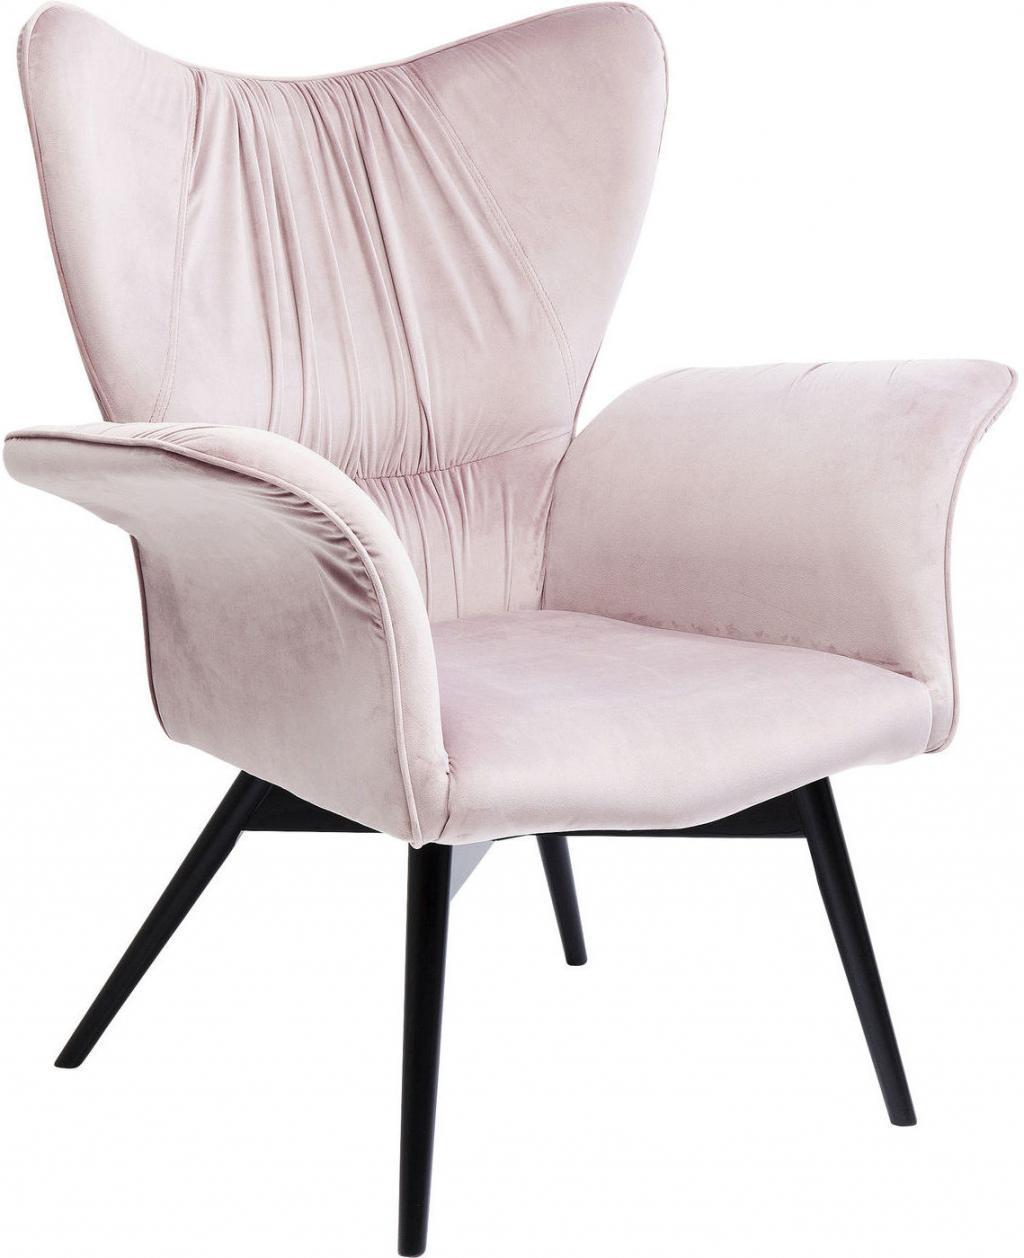 fauteuil wall street roze kare design. Black Bedroom Furniture Sets. Home Design Ideas